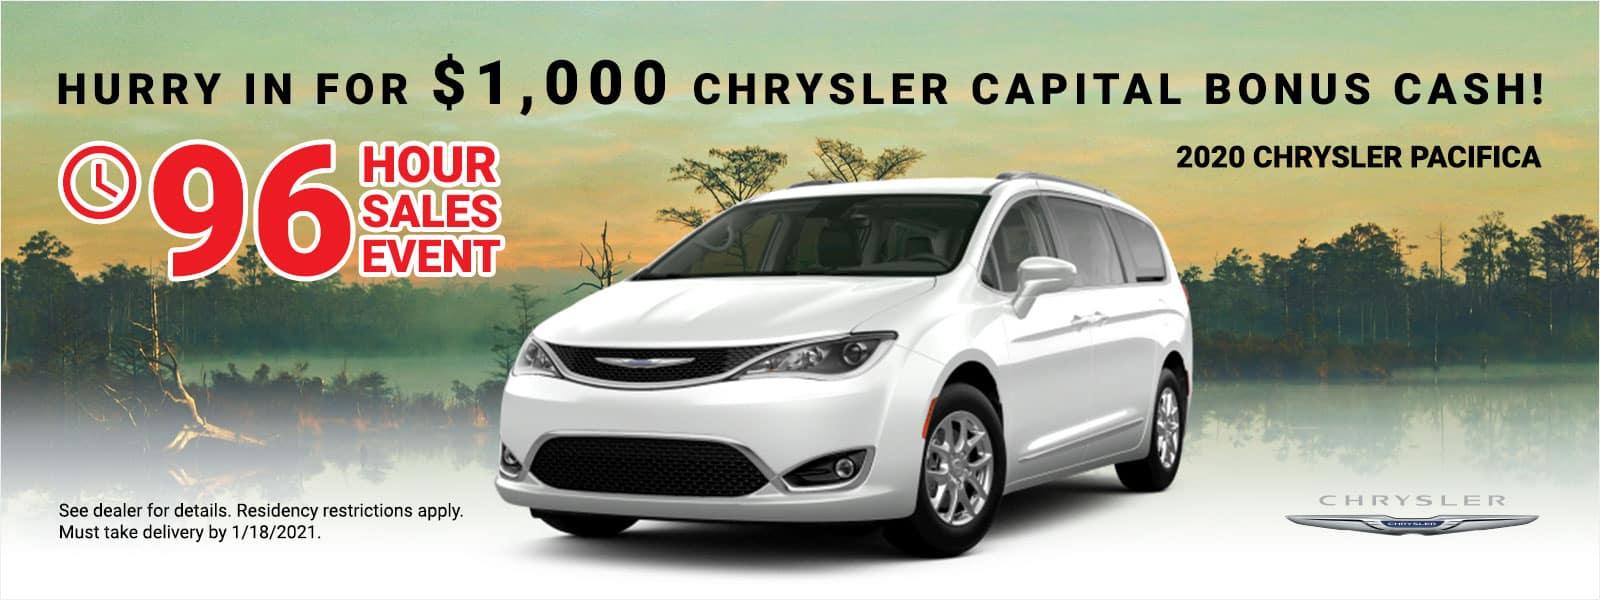 SEBC_Banners_1600x600_2021-01_517961_2020-Chrysler-Pacifica